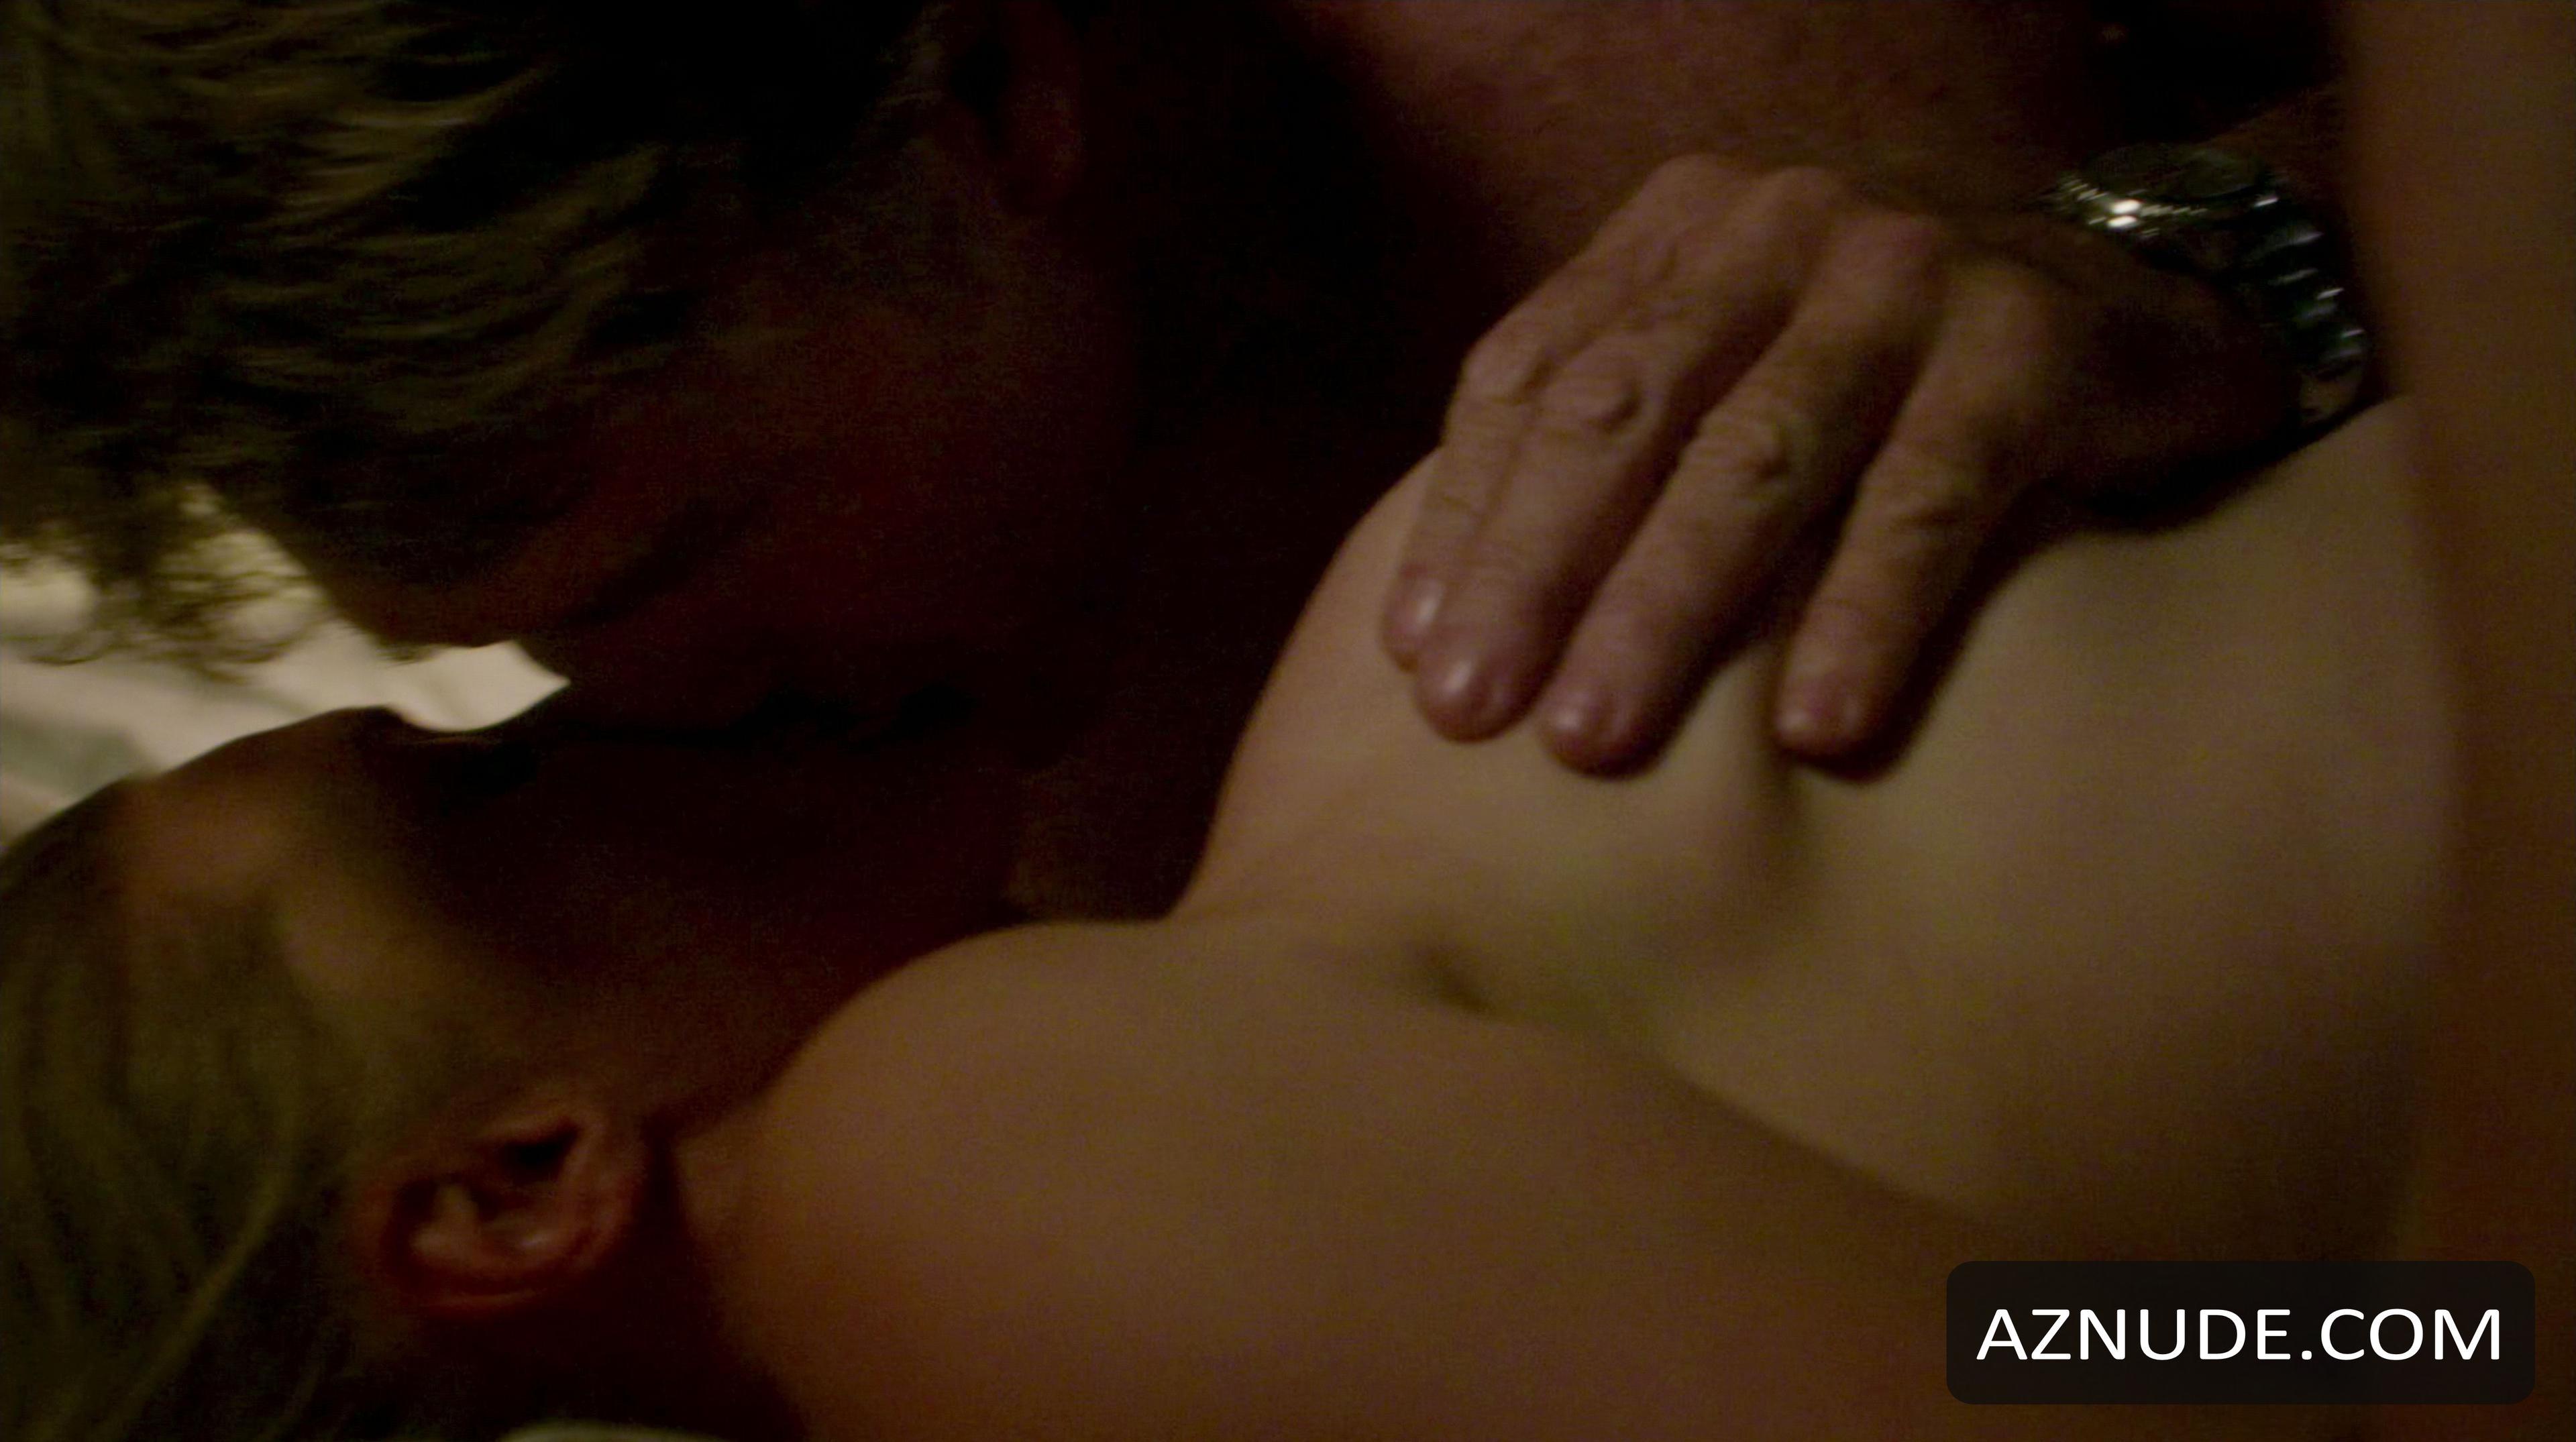 Katee sackhoff nude